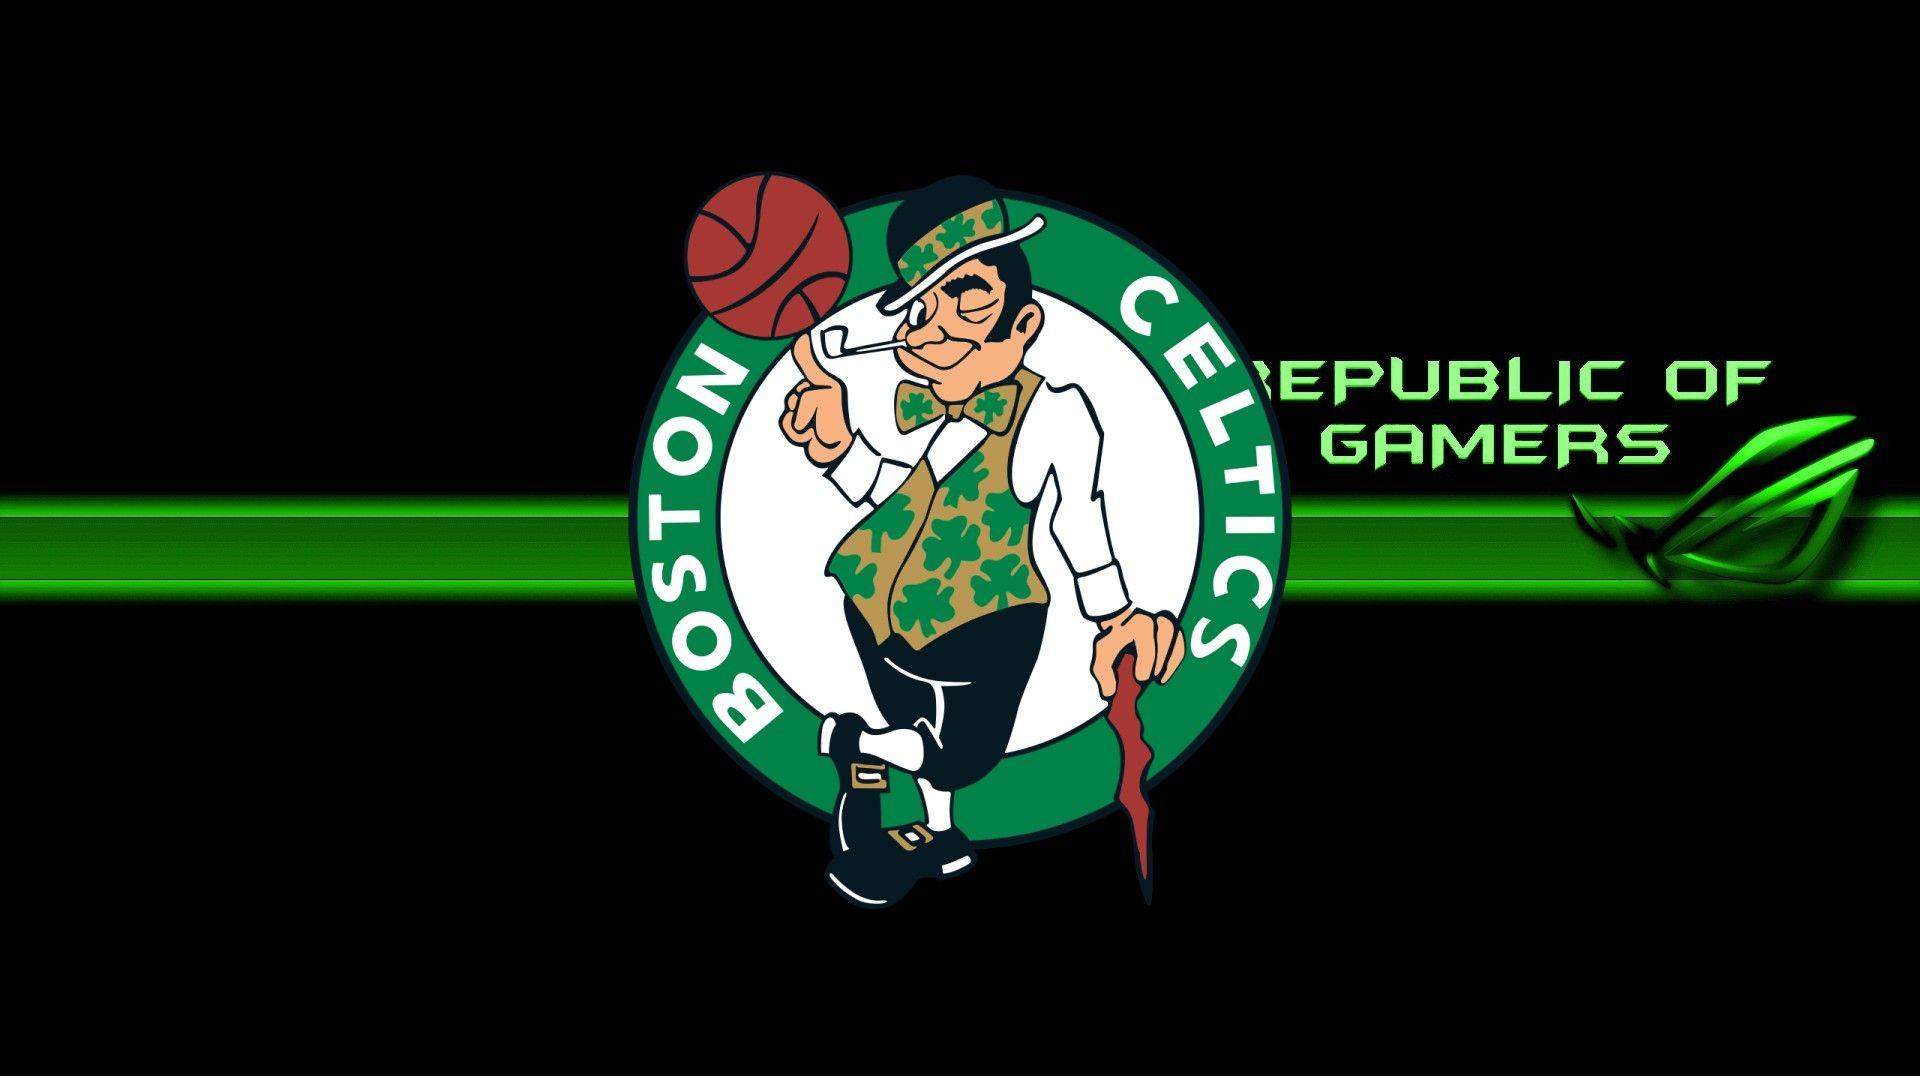 Windows Wallpaper Boston Celtics Logo 2021 Basketball Wallpaper Boston Celtics Logo Basketball Wallpaper Boston Celtics